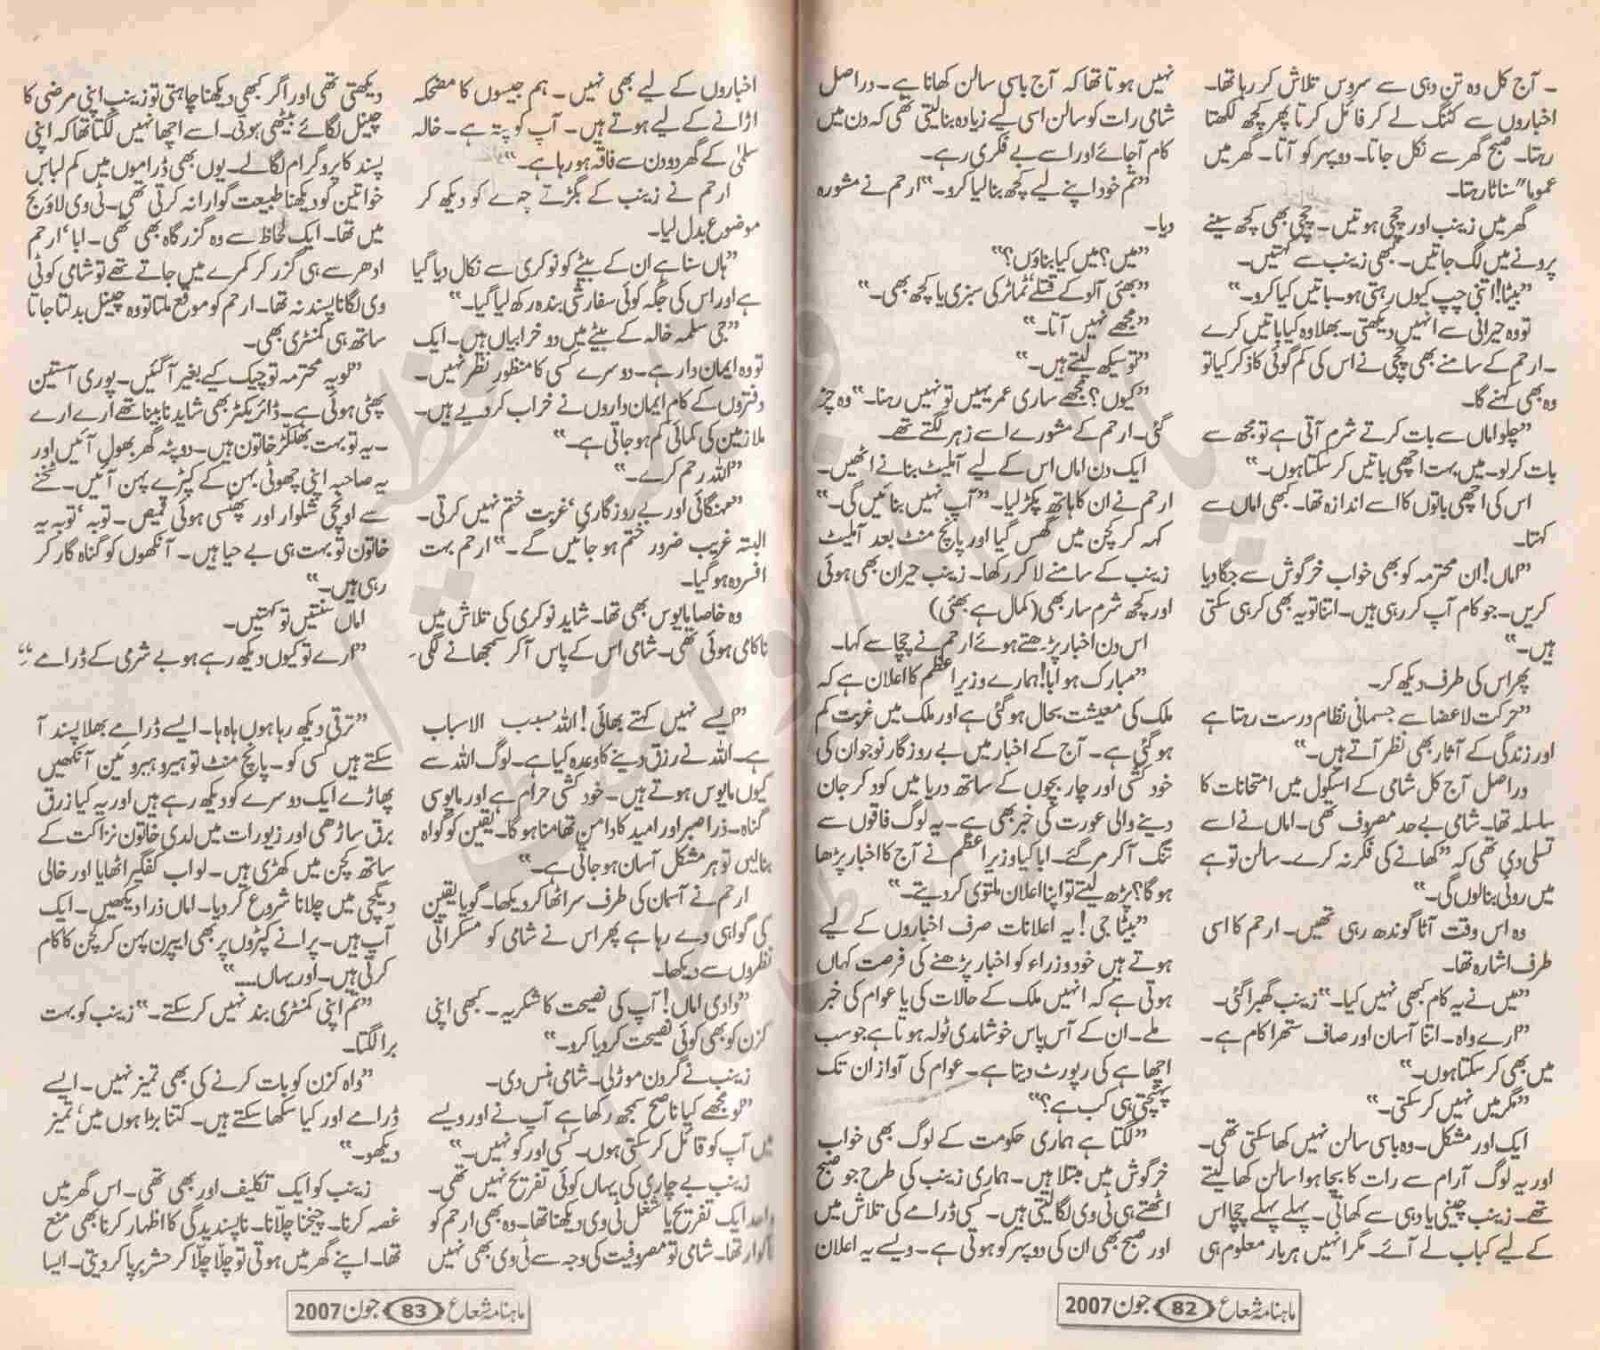 Pehli Pehli Bar Rohanpreet: Free Urdu Digests: Pehli Bar Novel By Aasia Razaqi Online